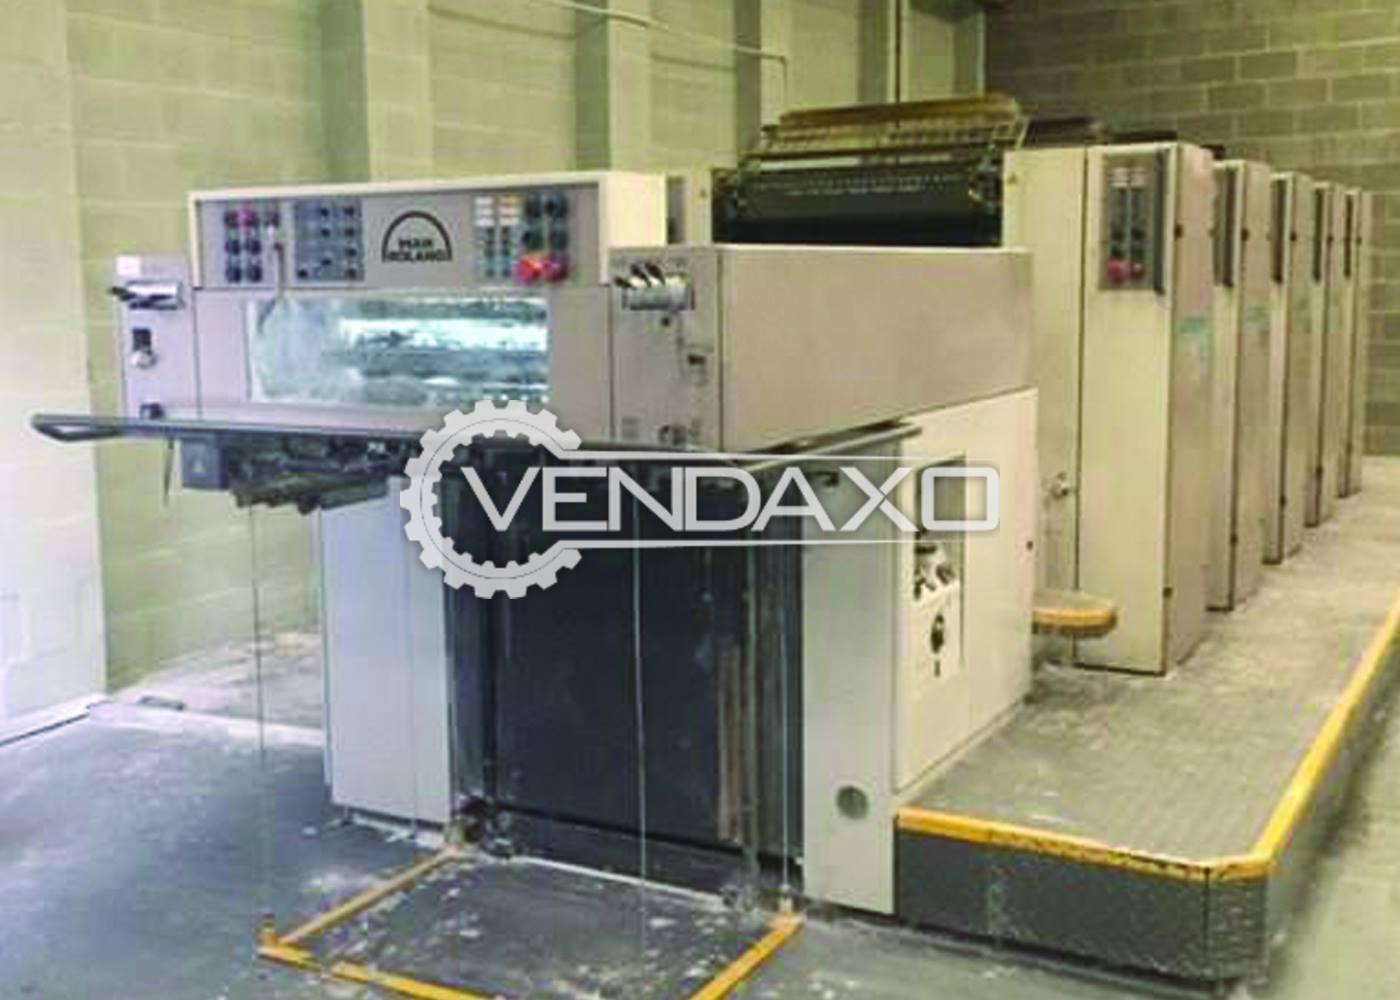 Man Roland R305P Offset Printing Machine - 5 Color